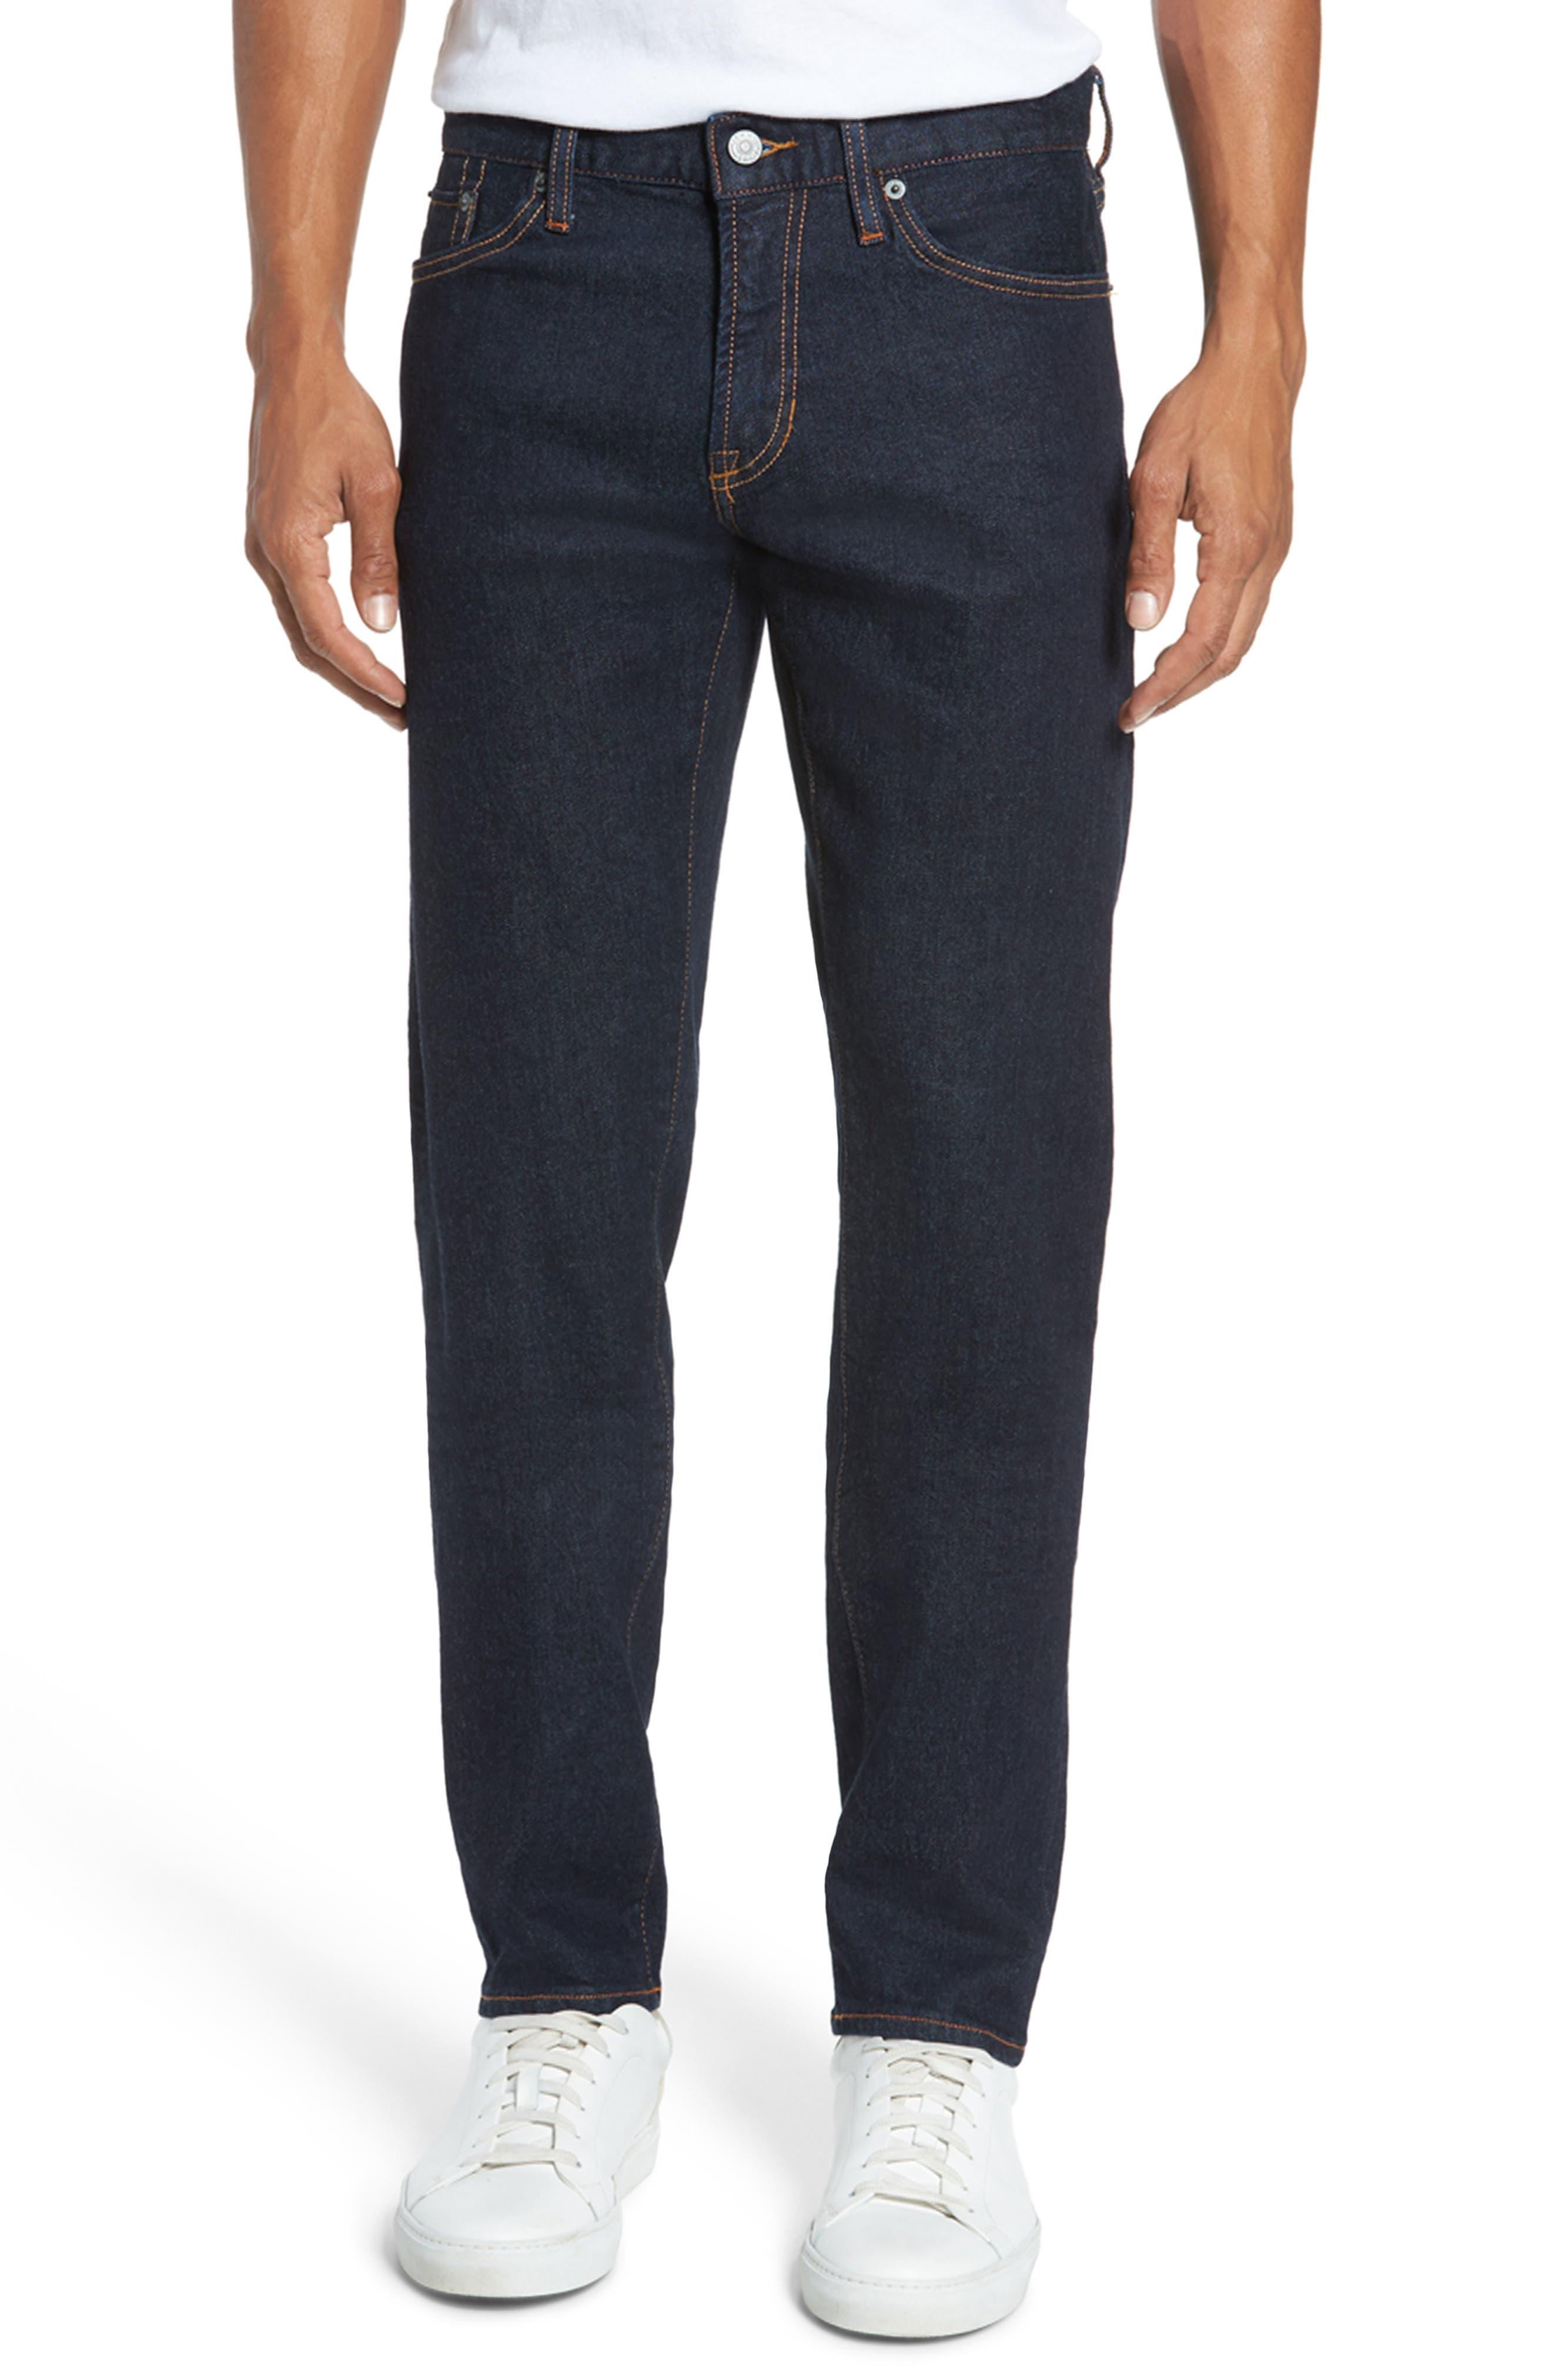 Jim Slim Fit Selvedge Jeans,                         Main,                         color, 460